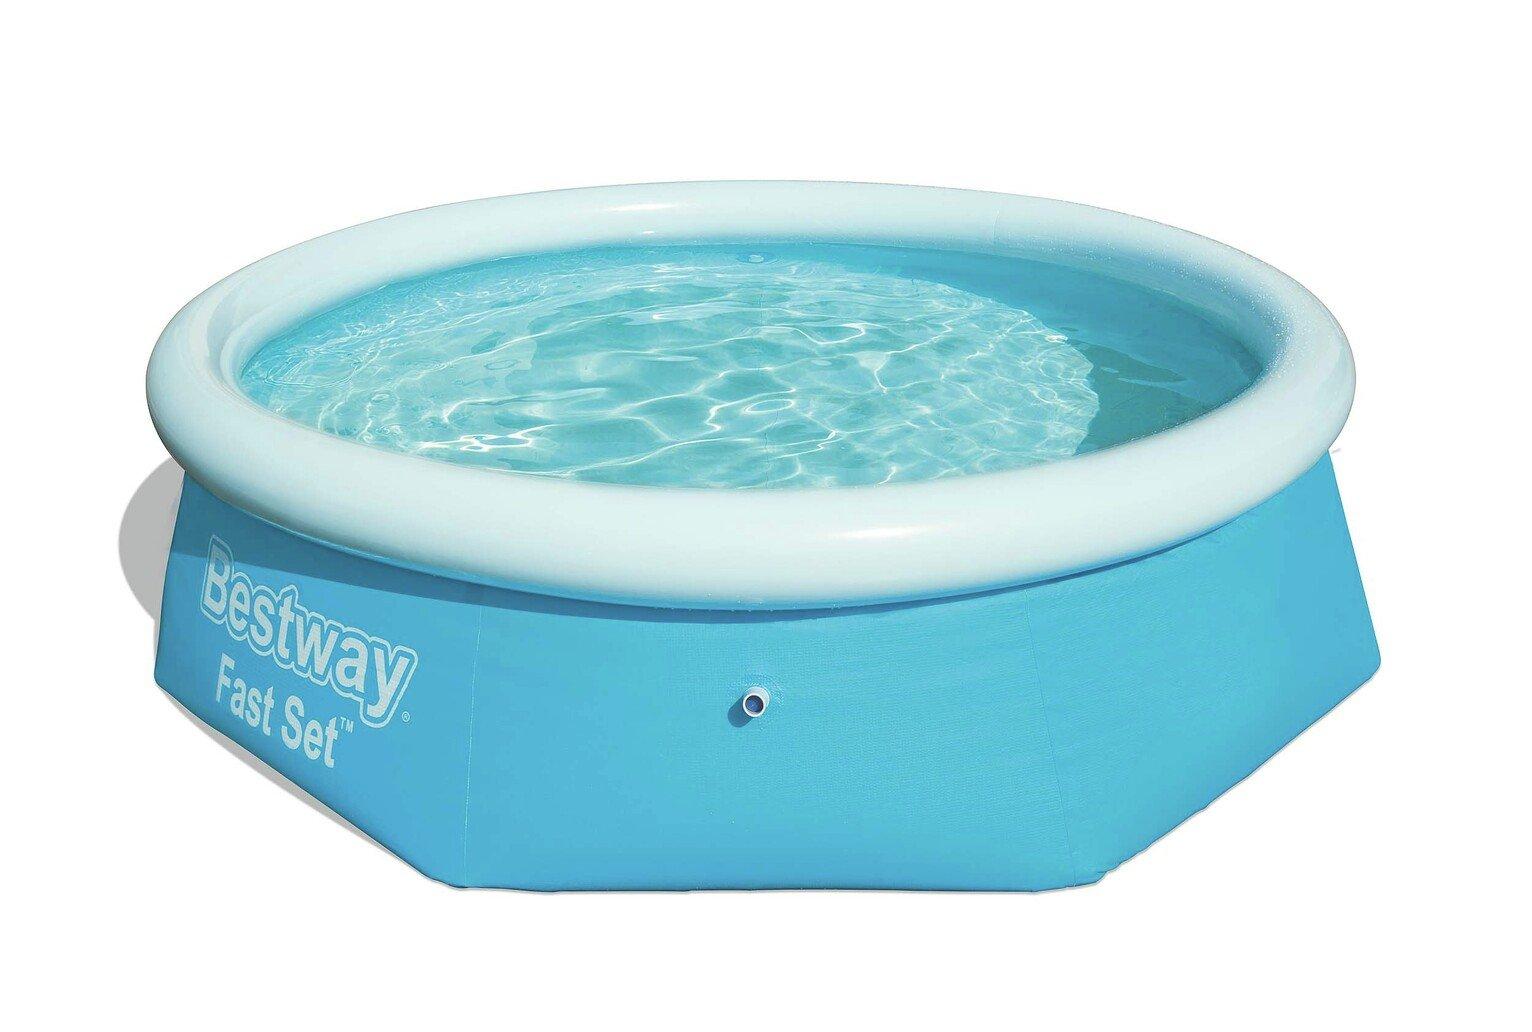 Bestway Fast Set Pool - 8ft - 2300 Litres